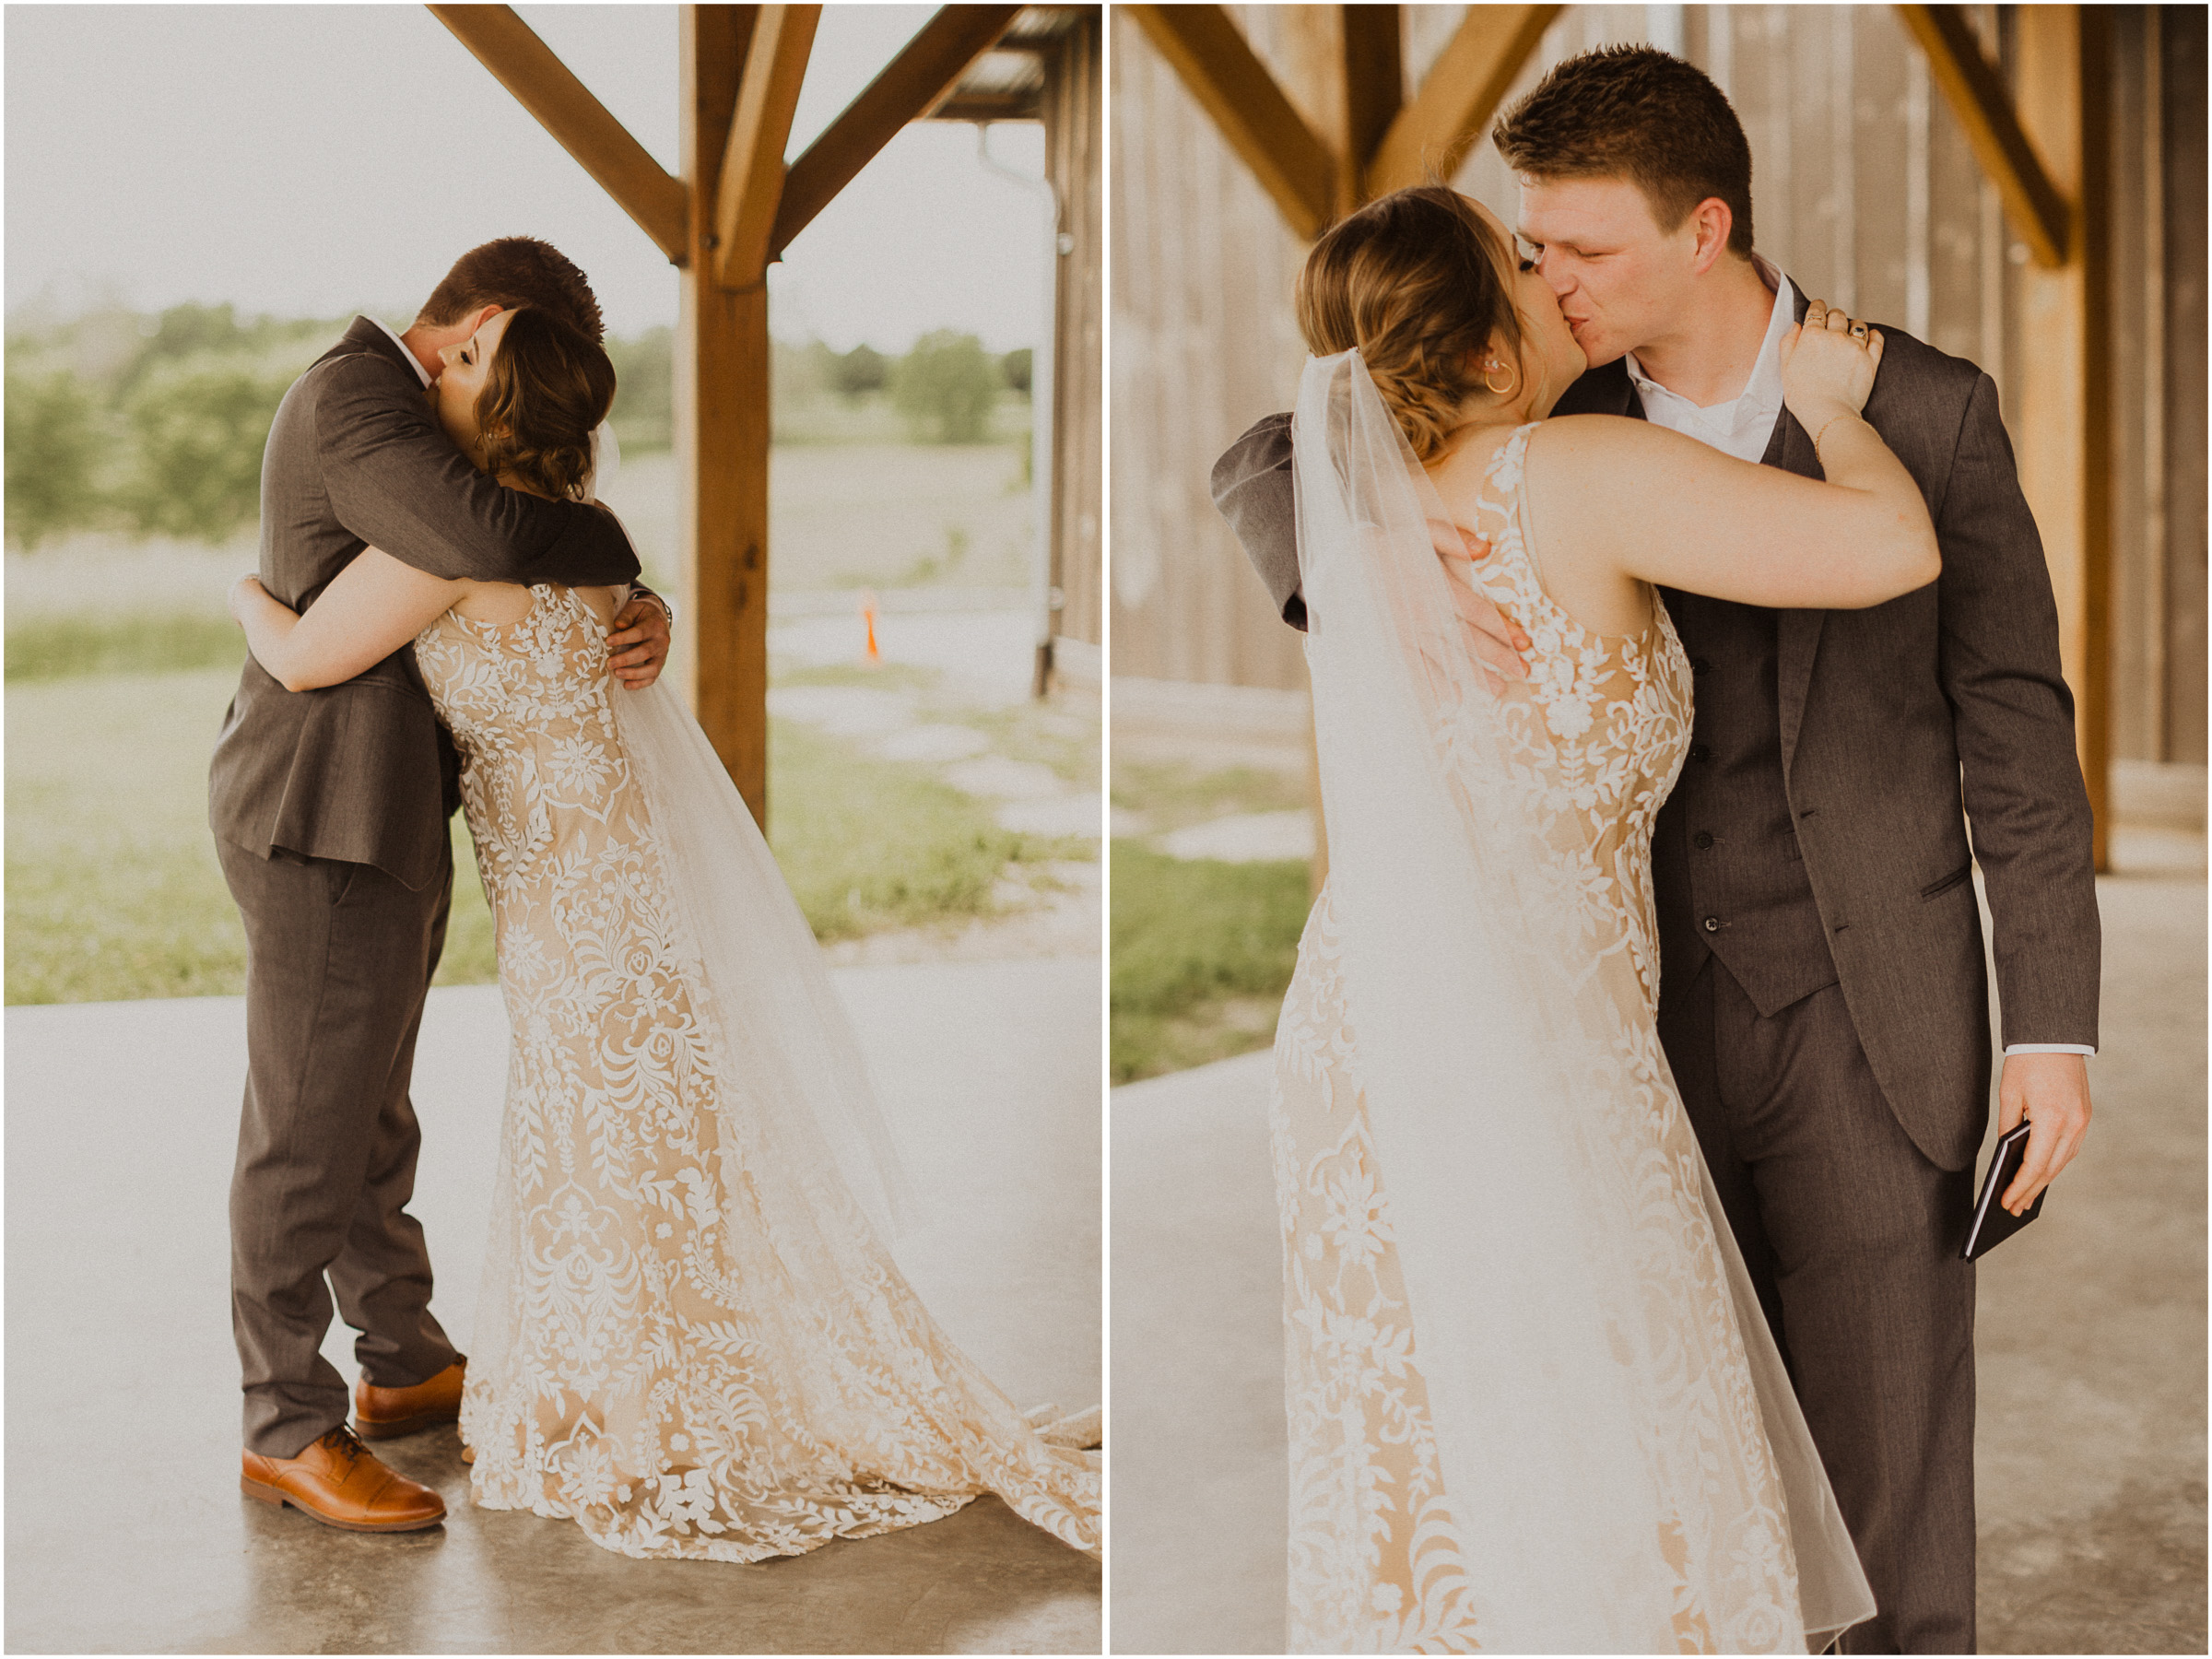 alyssa barletter photography weston red barn farm timberbarn summer outdoor wedding-12.jpg